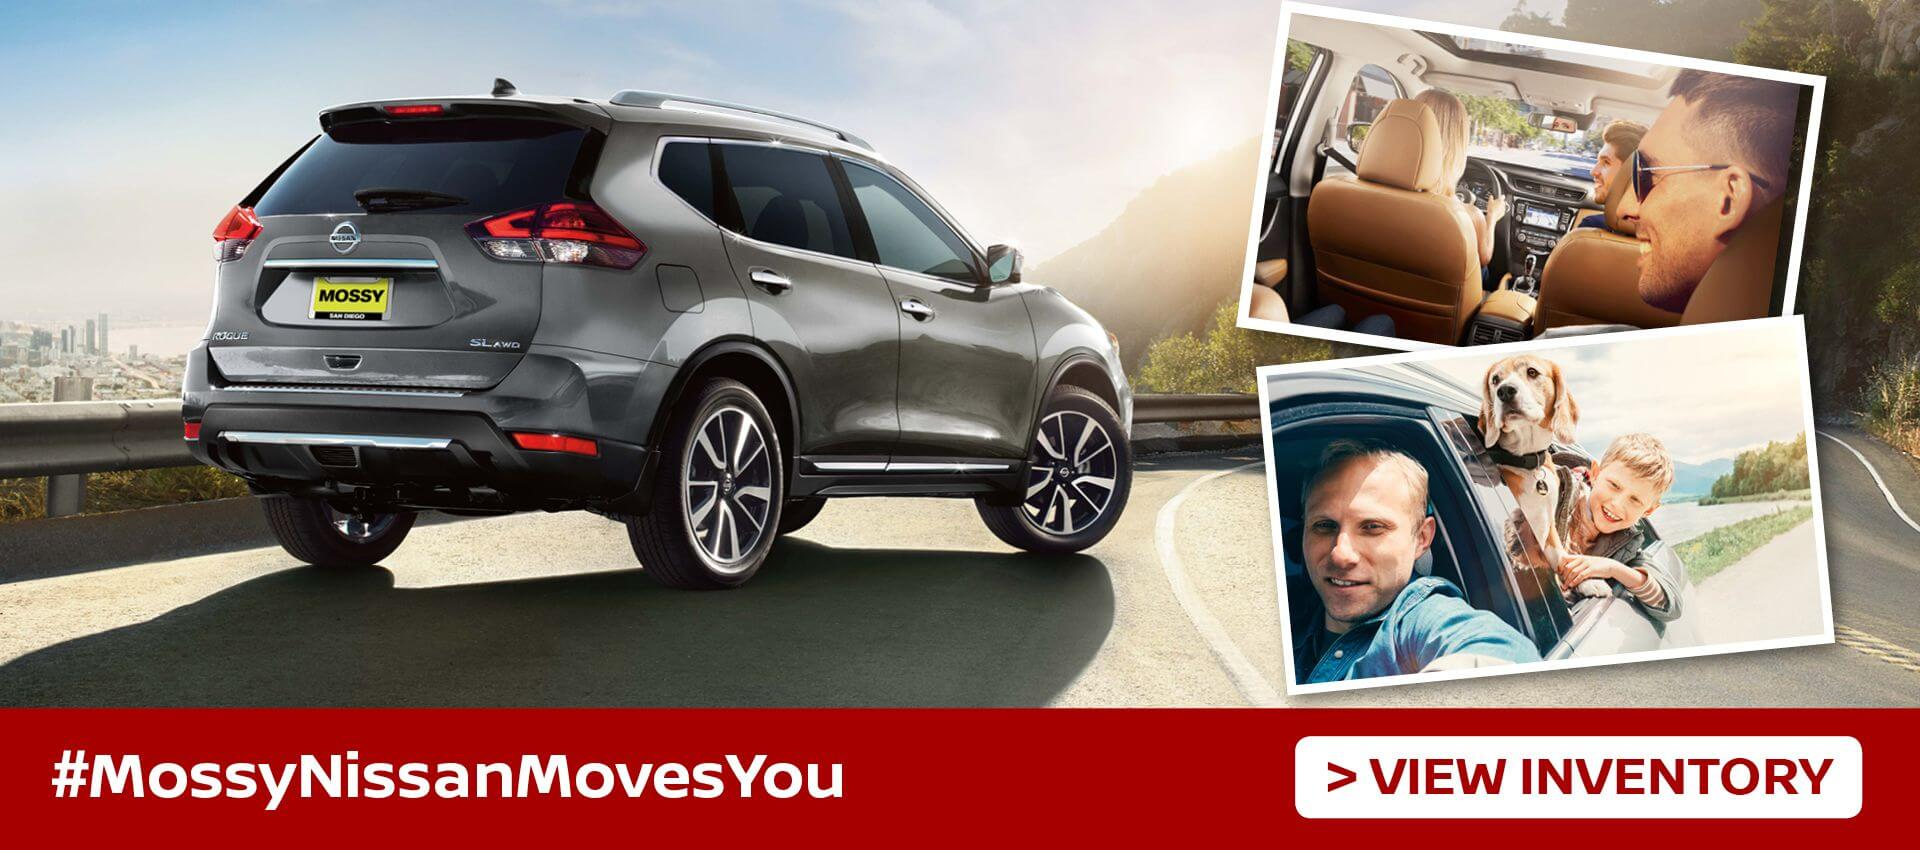 New 2017 2018 Nissan U0026 Used Car Dealer In San Diego, CA | Mossy Nissan 7  Locations